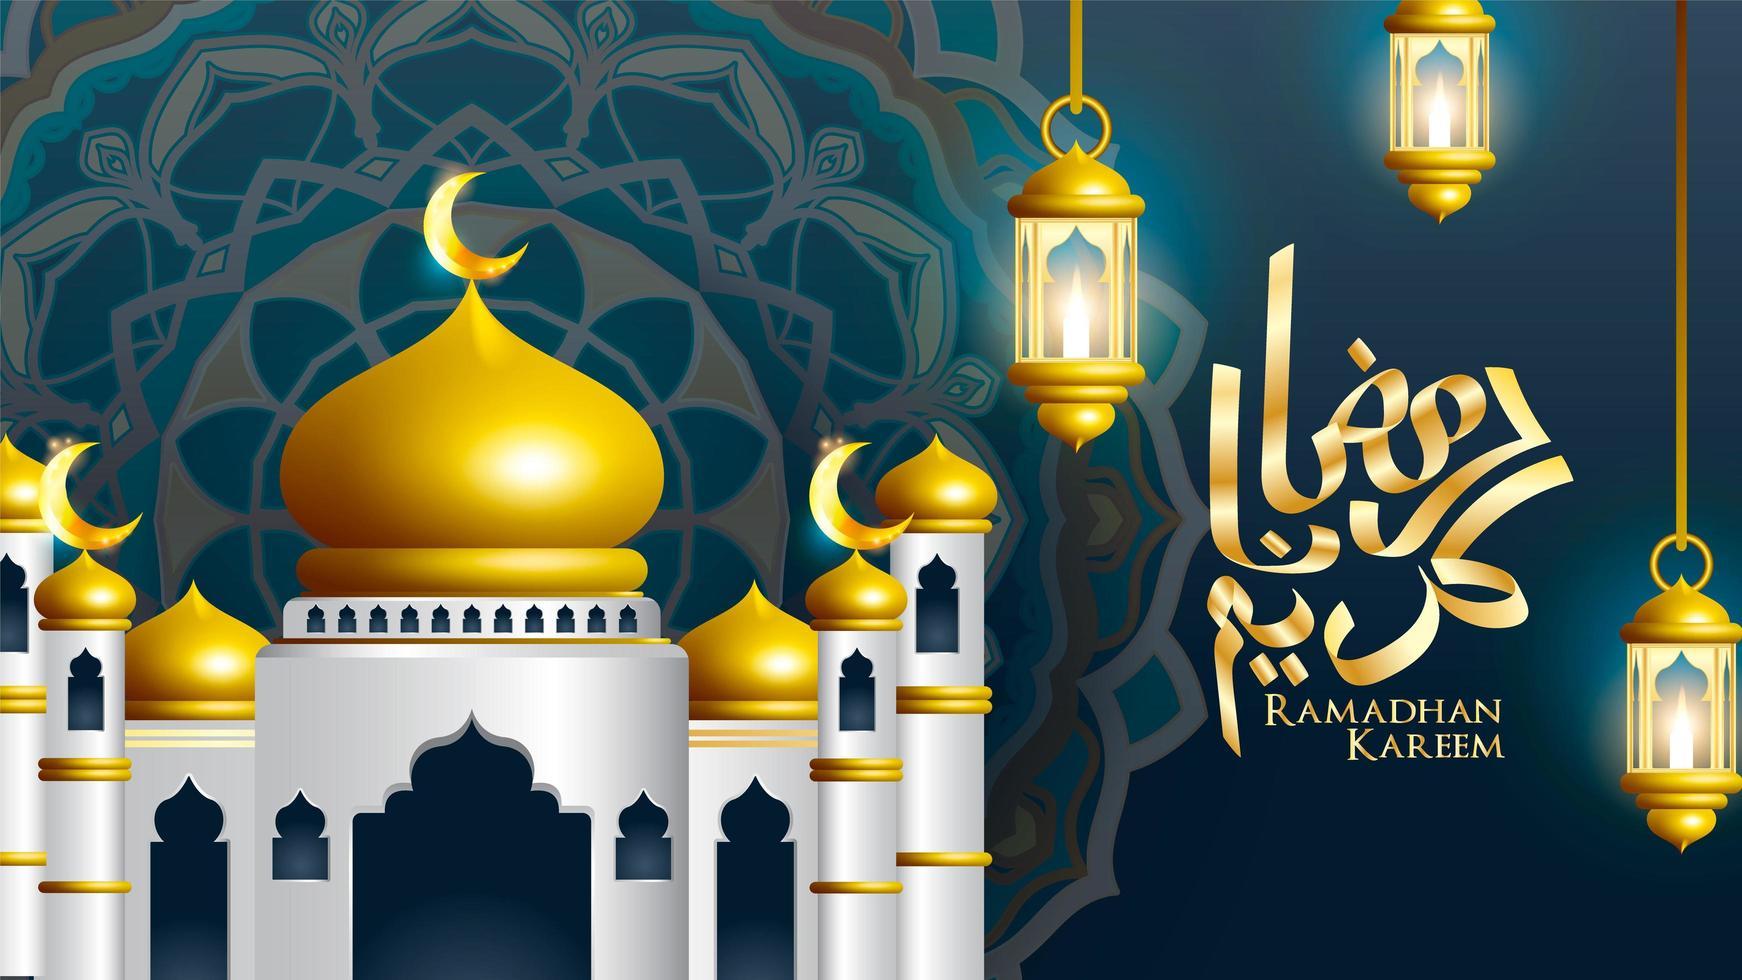 Ramadan Kareem calligraphy with mosque and lanterns vector